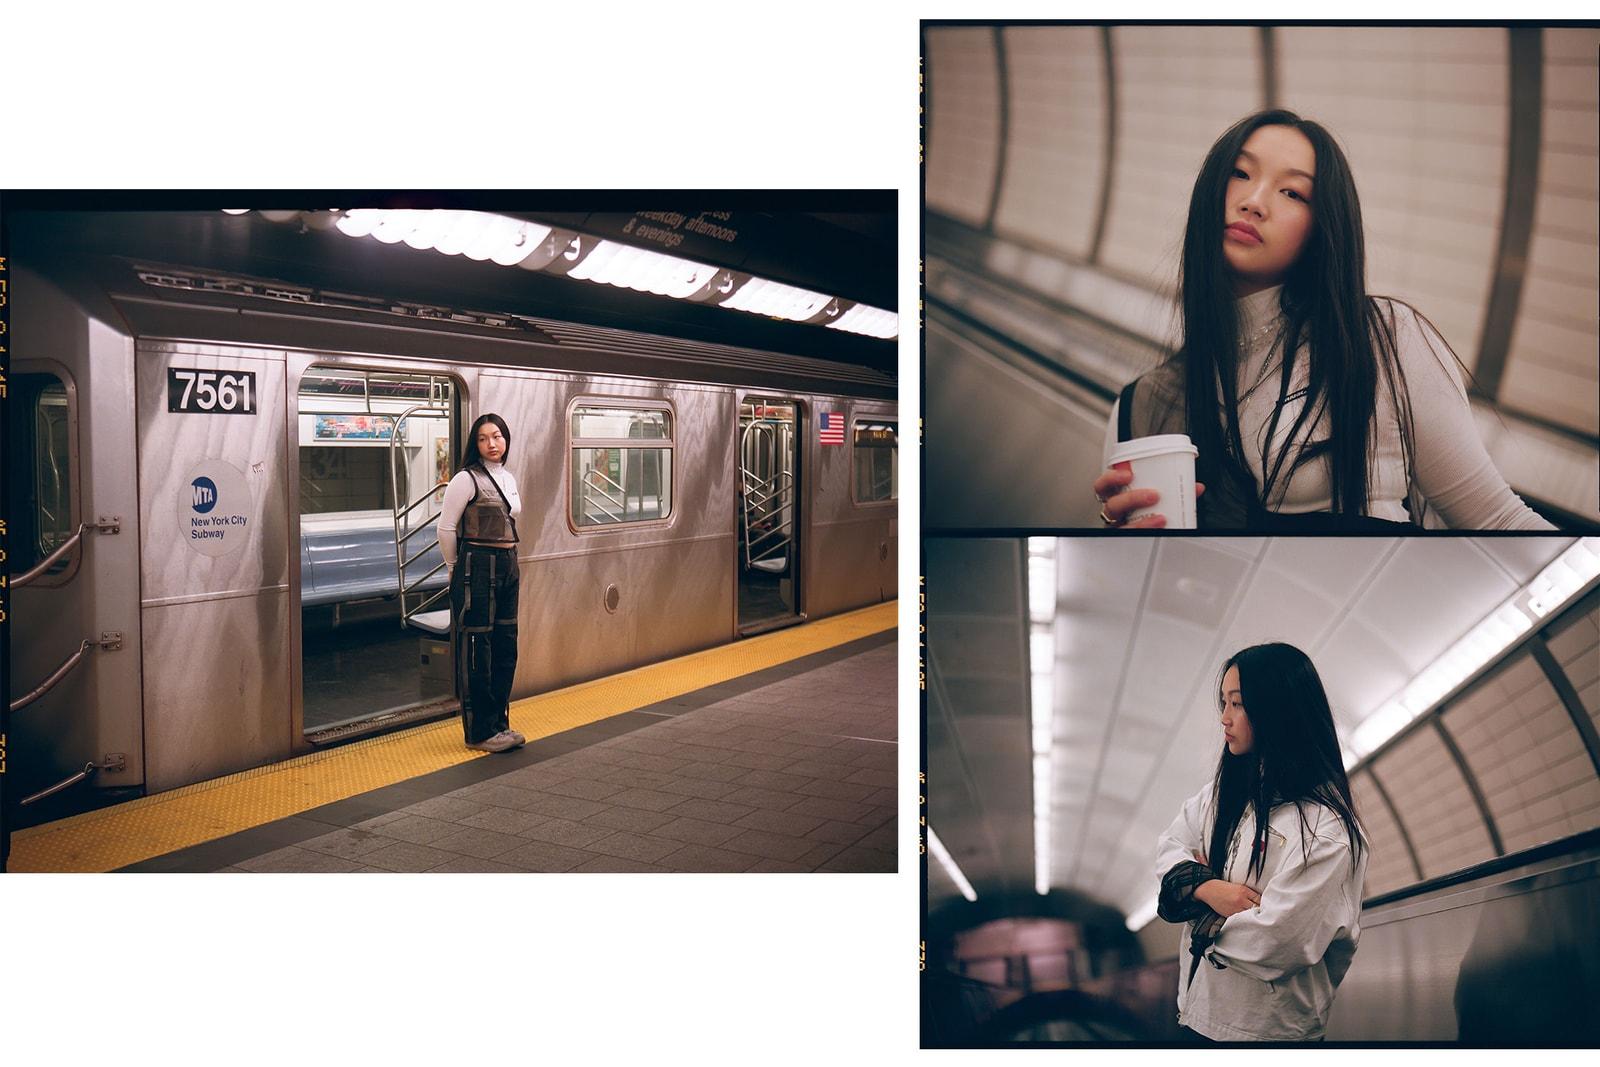 audrey chu nuna korean-american hip-hop r&b singer interview comic sans new york jack harlow